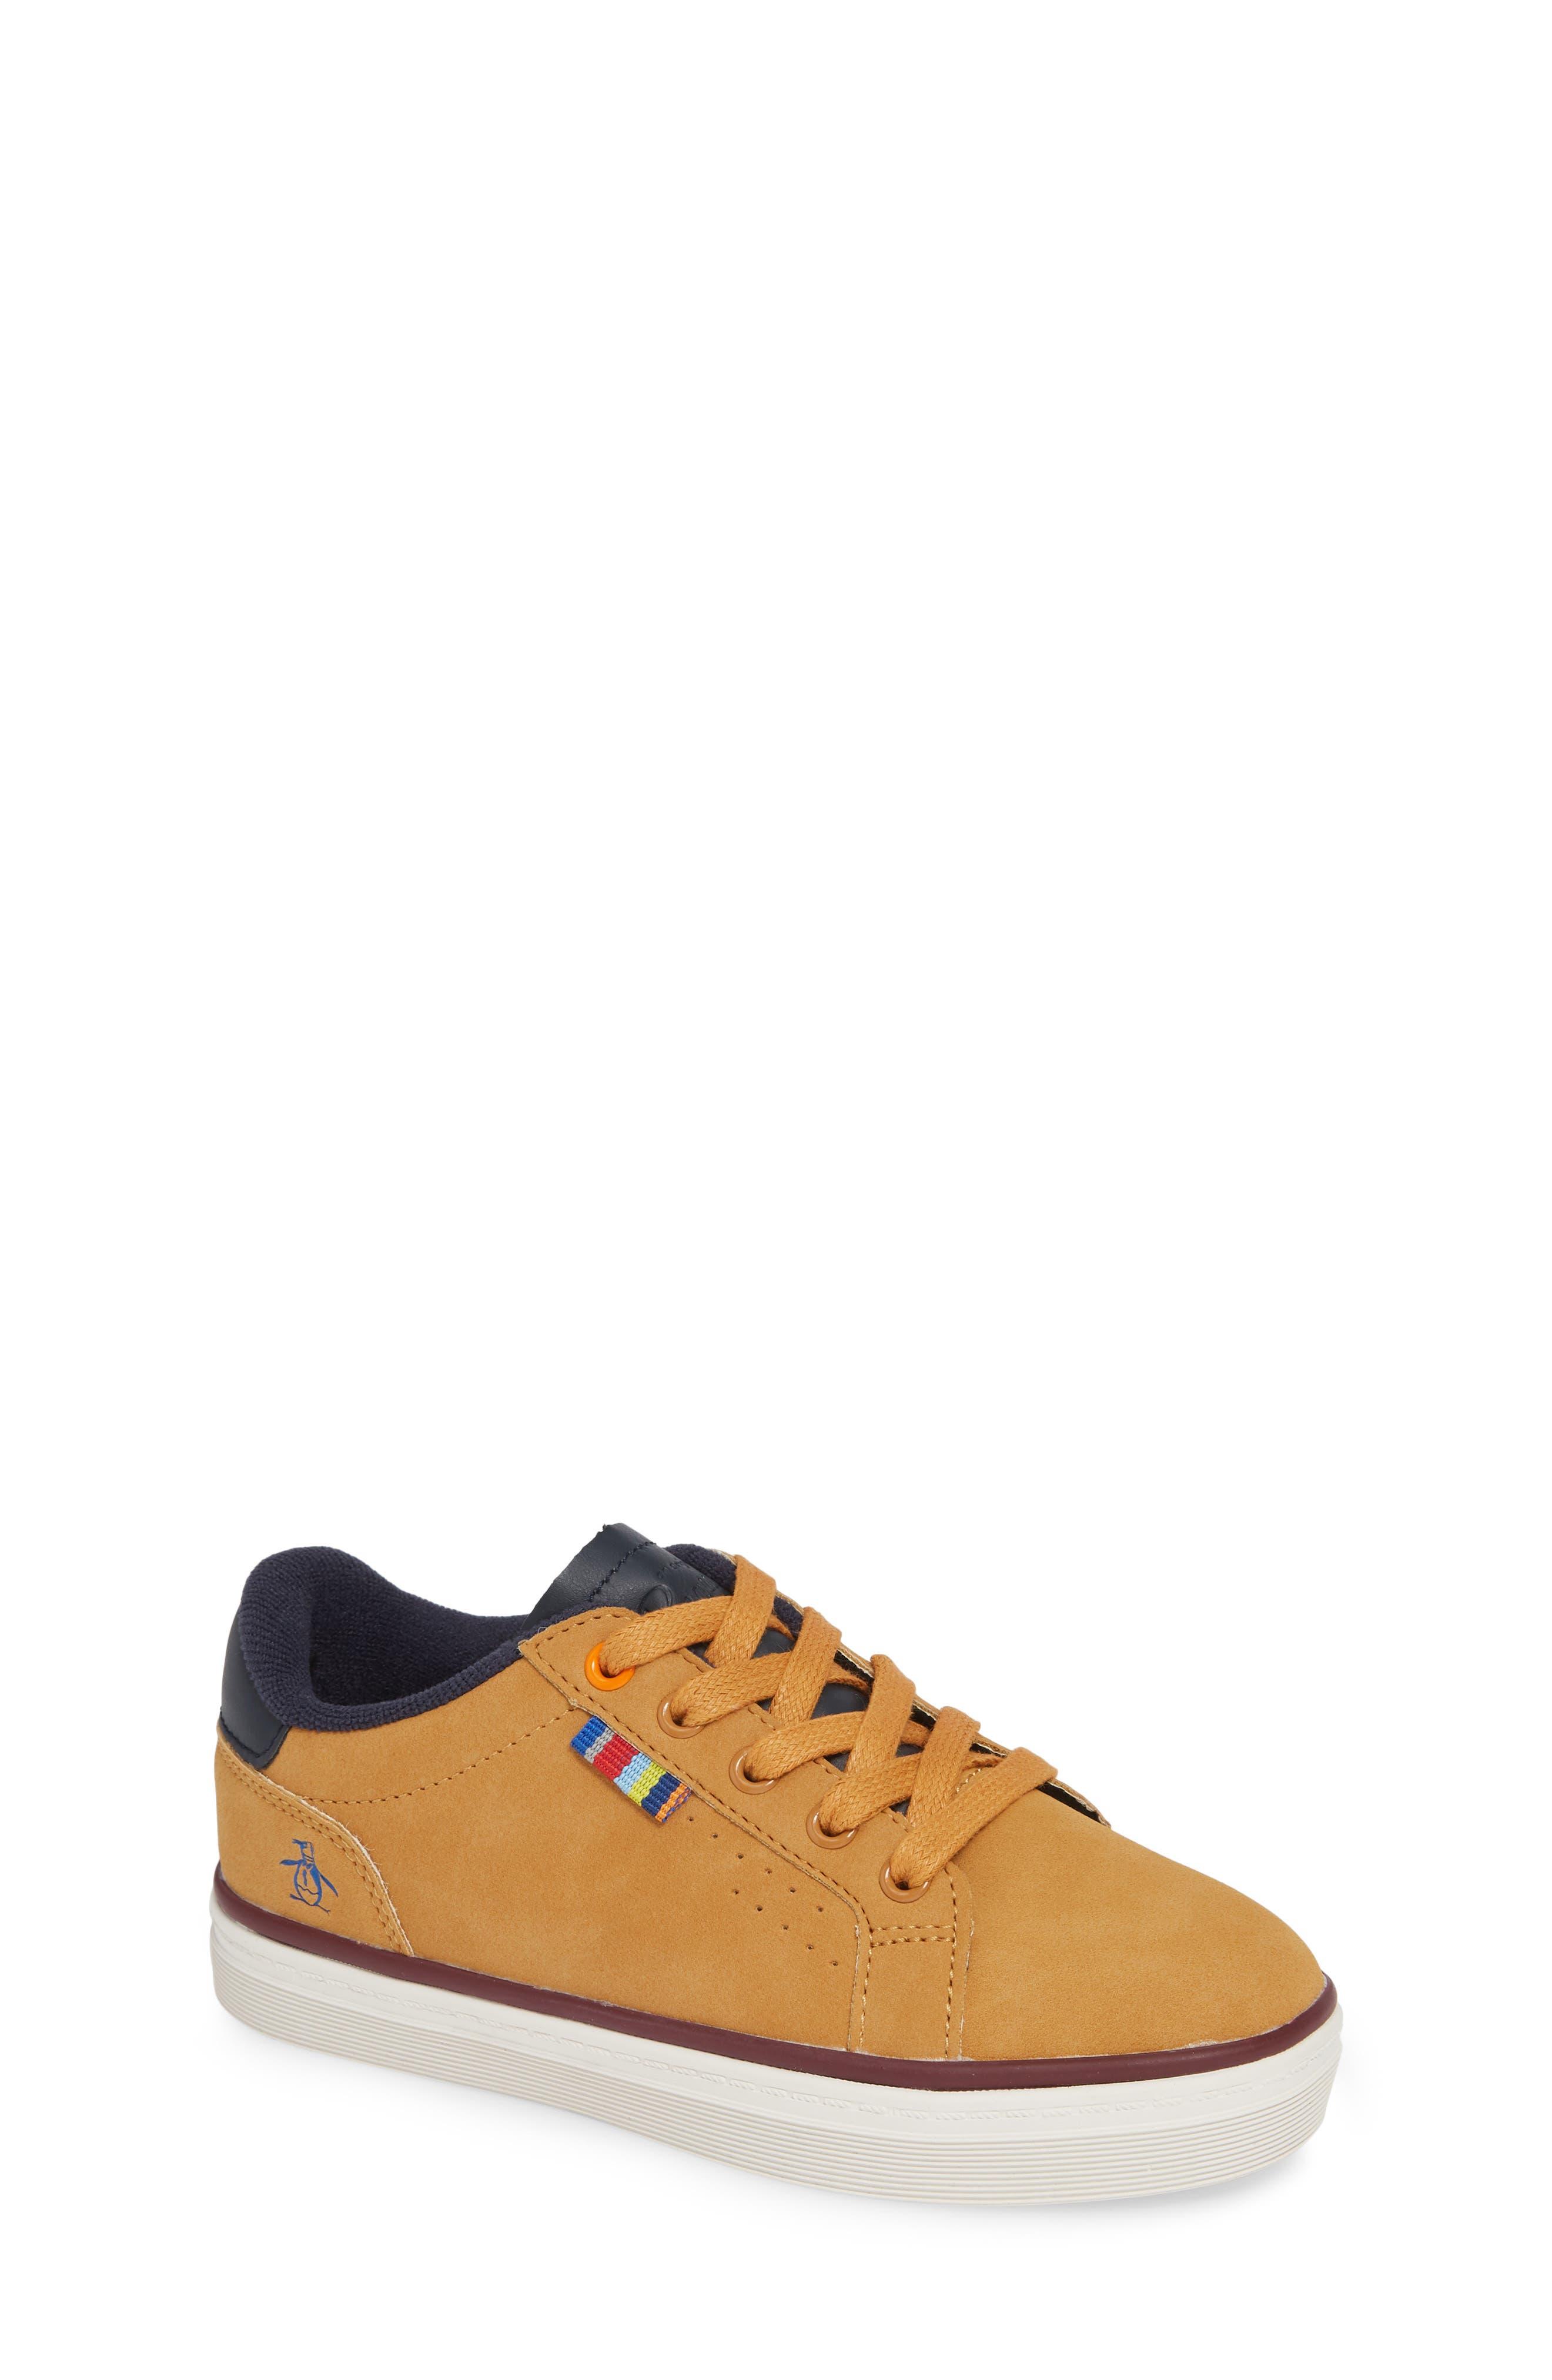 ORIGINAL PENGUIN Dexter Sneaker, Main, color, WHEAT/ NAVY